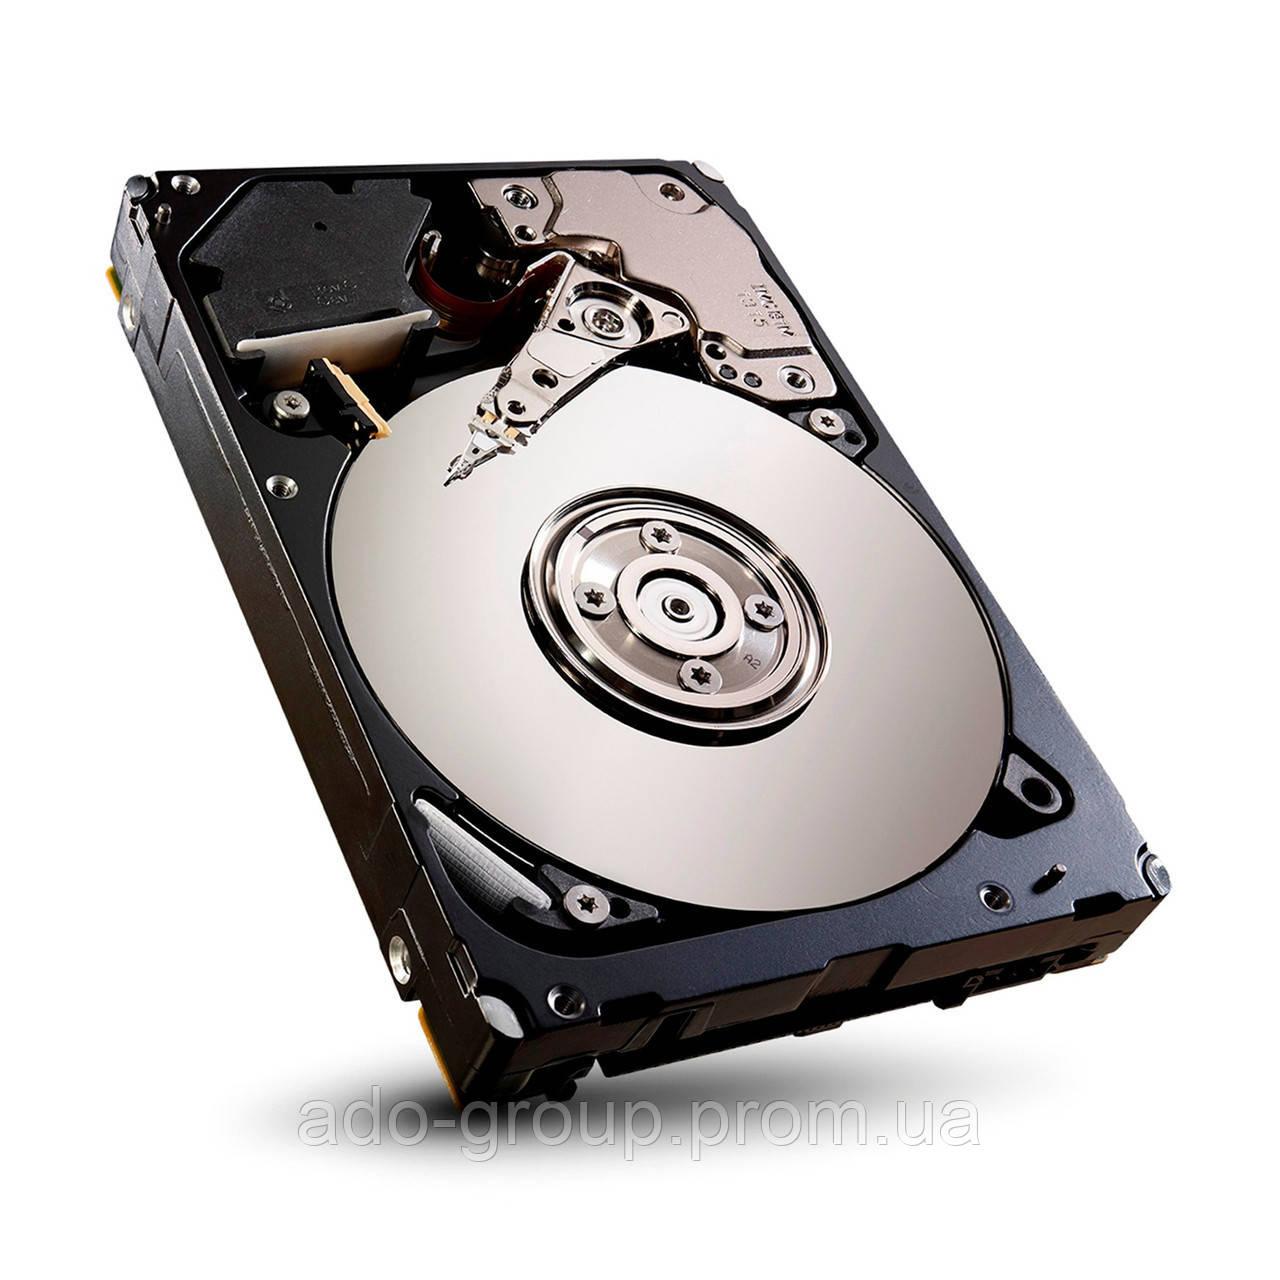 "HR044 Жесткий диск Dell 73GB SAS 15K  2.5"" +"